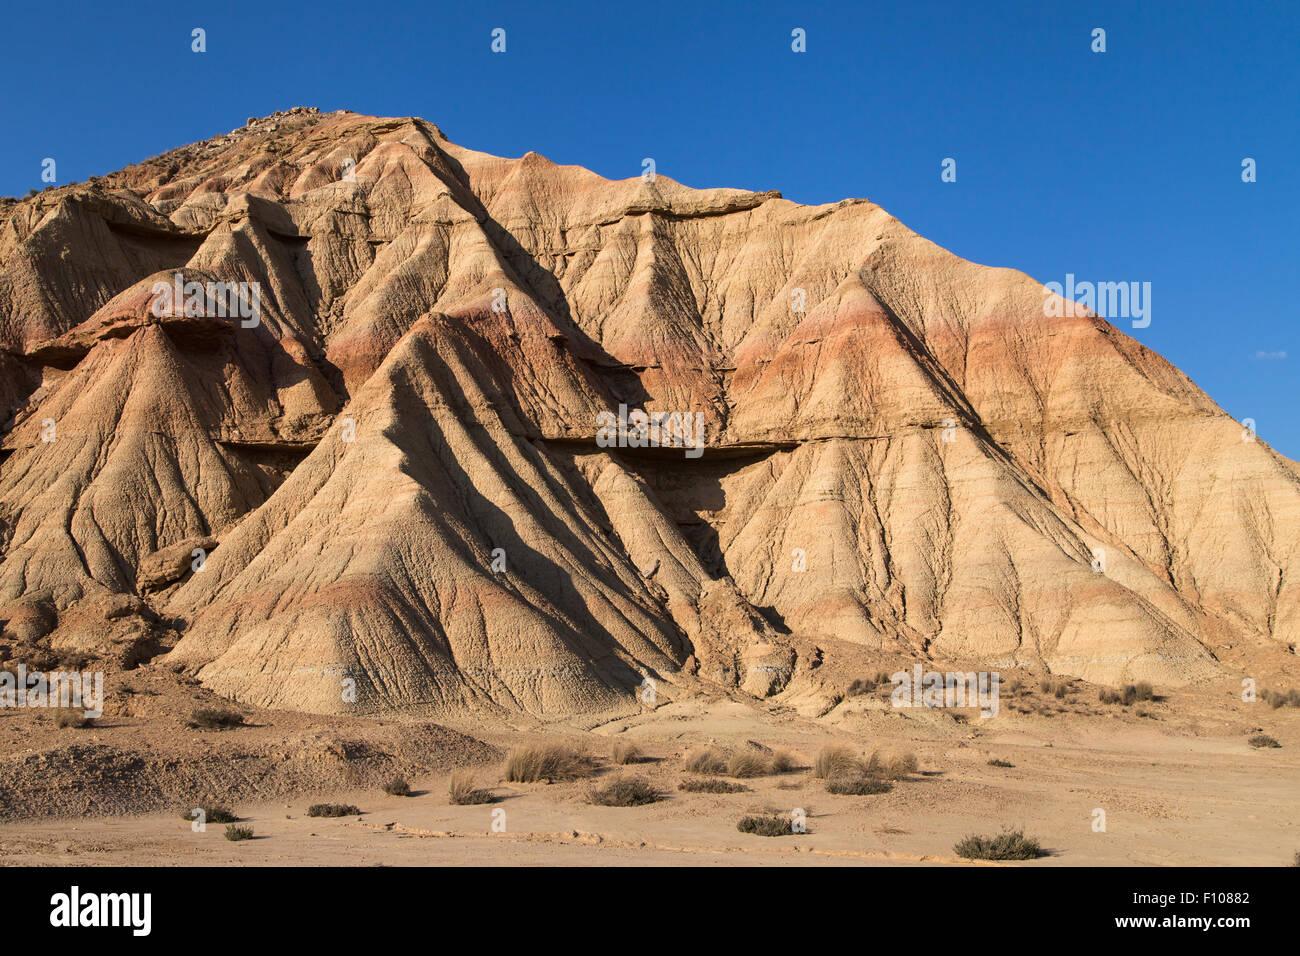 Landforms in Bardena Blanca, Bardenas Reales, Navarra, Spagna. Foto Stock